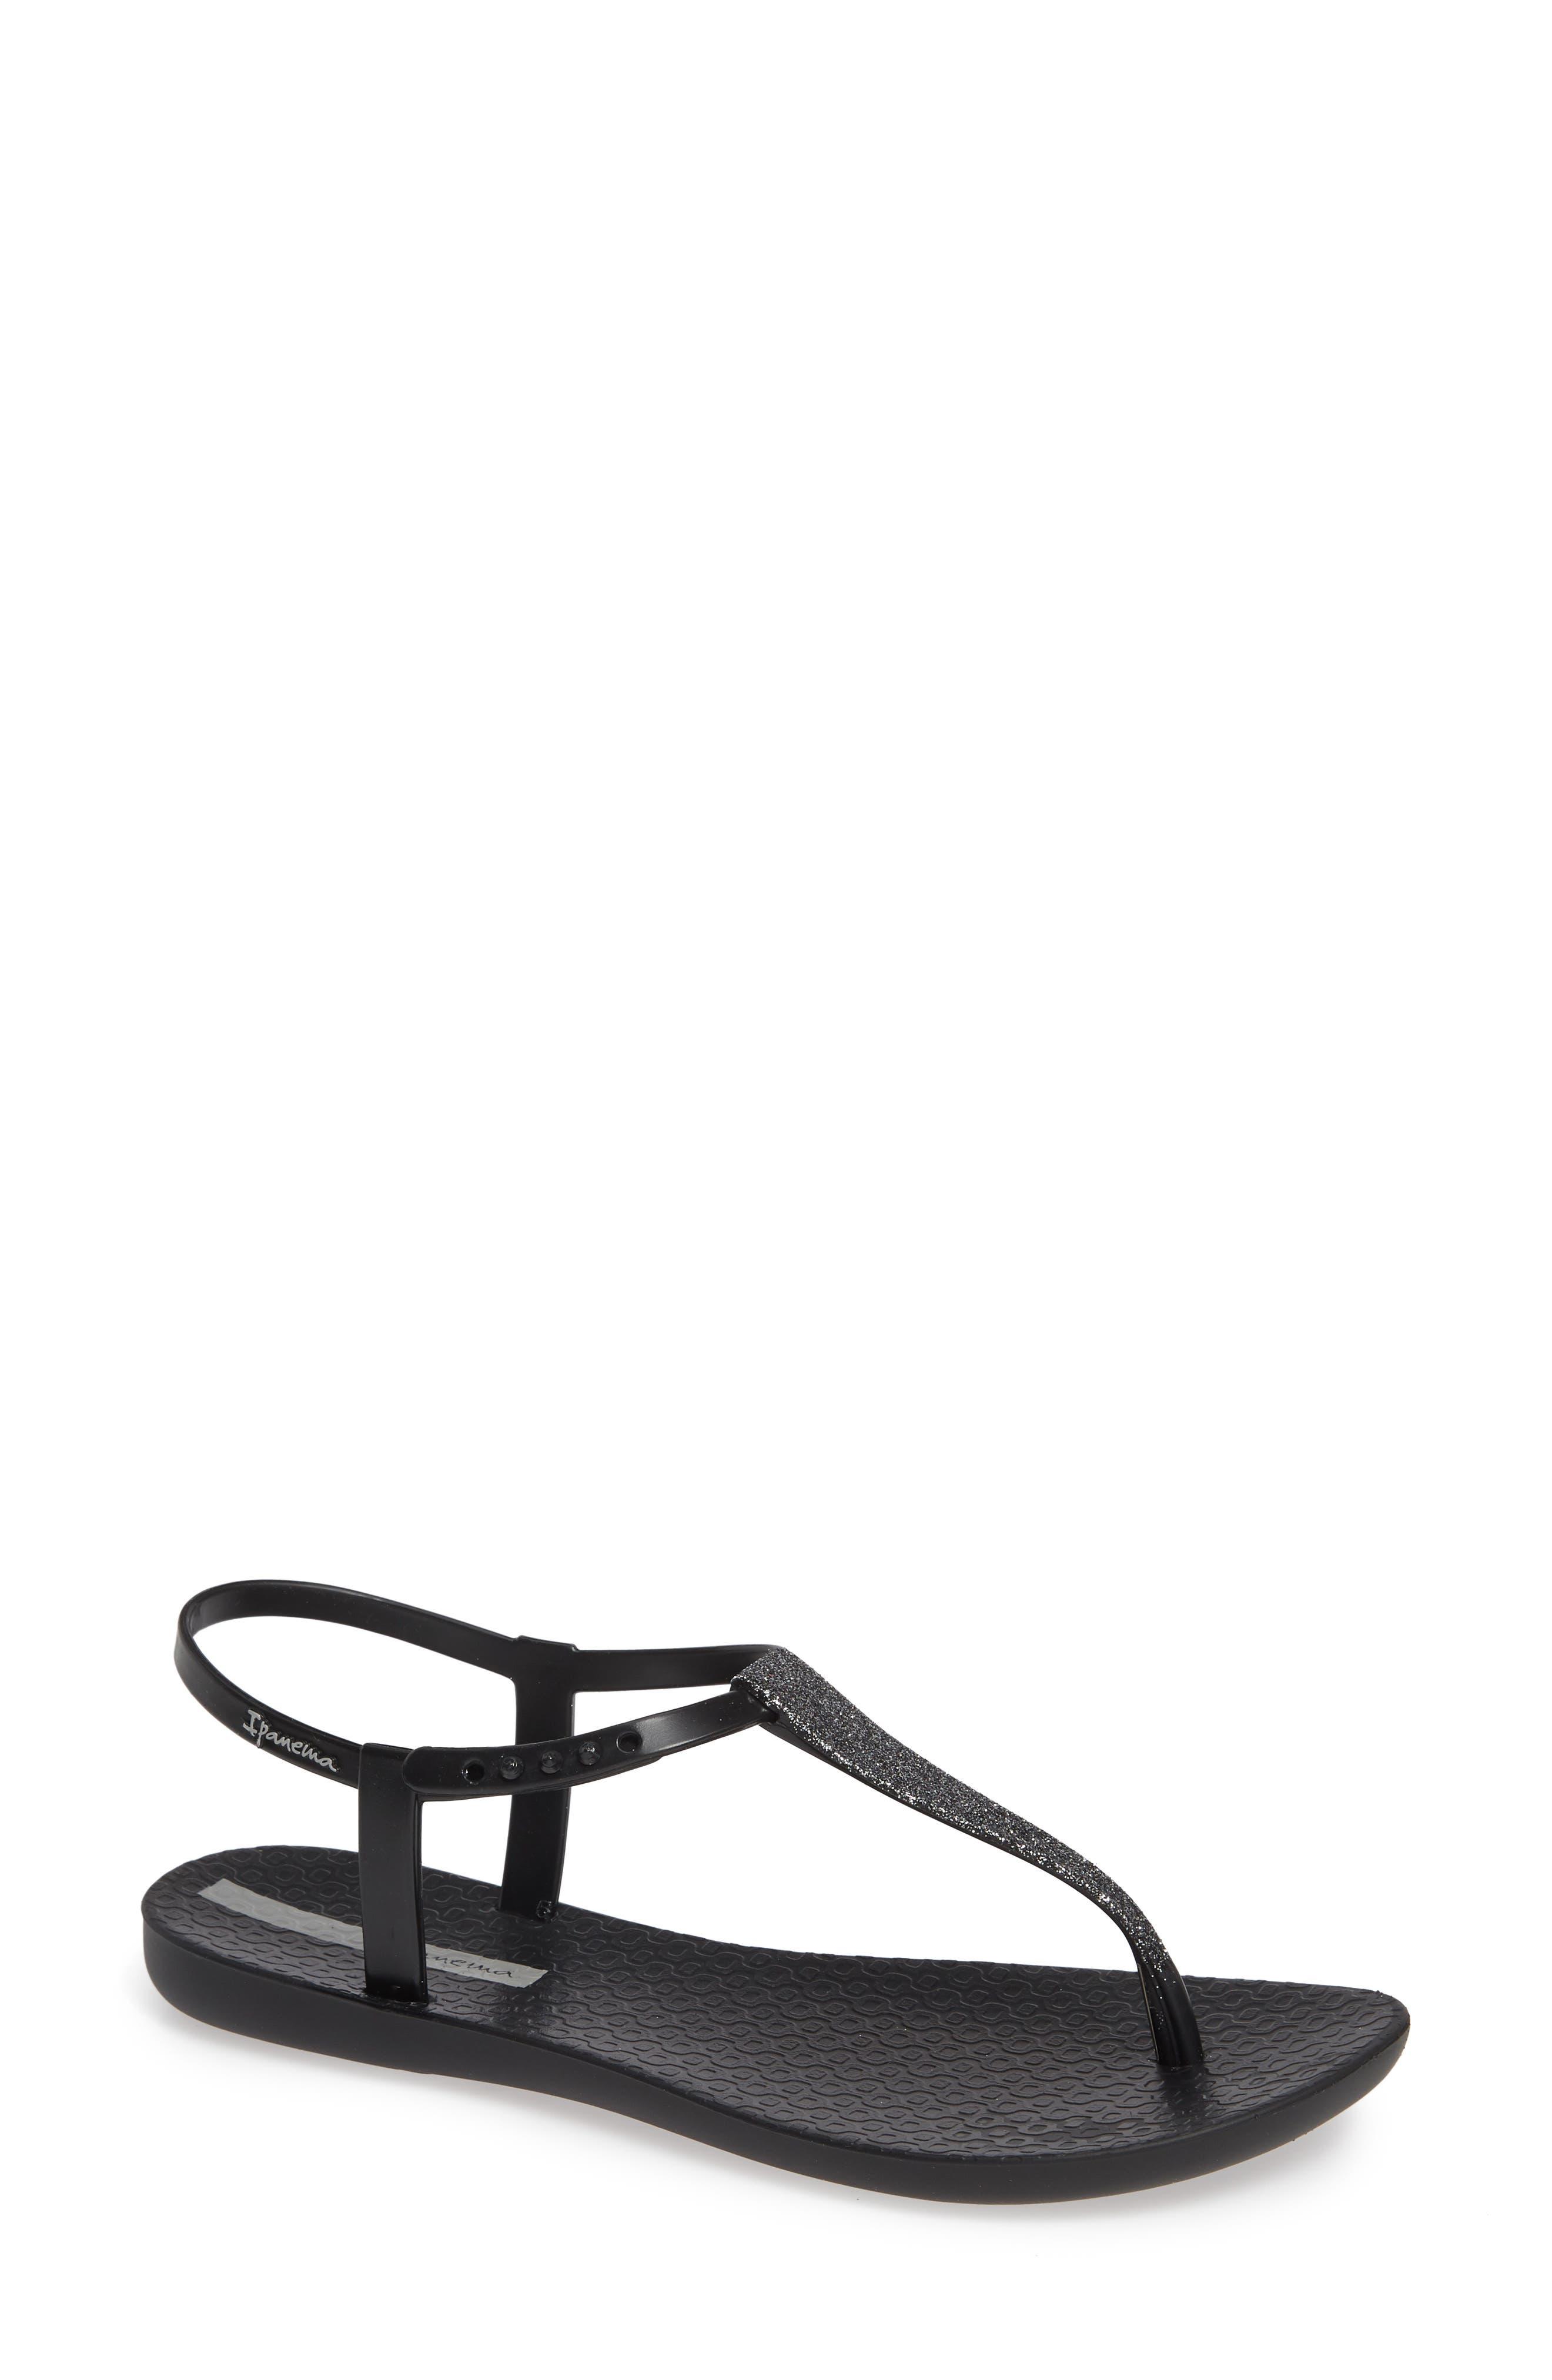 IPANEMA Shimmer Sandal, Main, color, BLACK/ SILVER